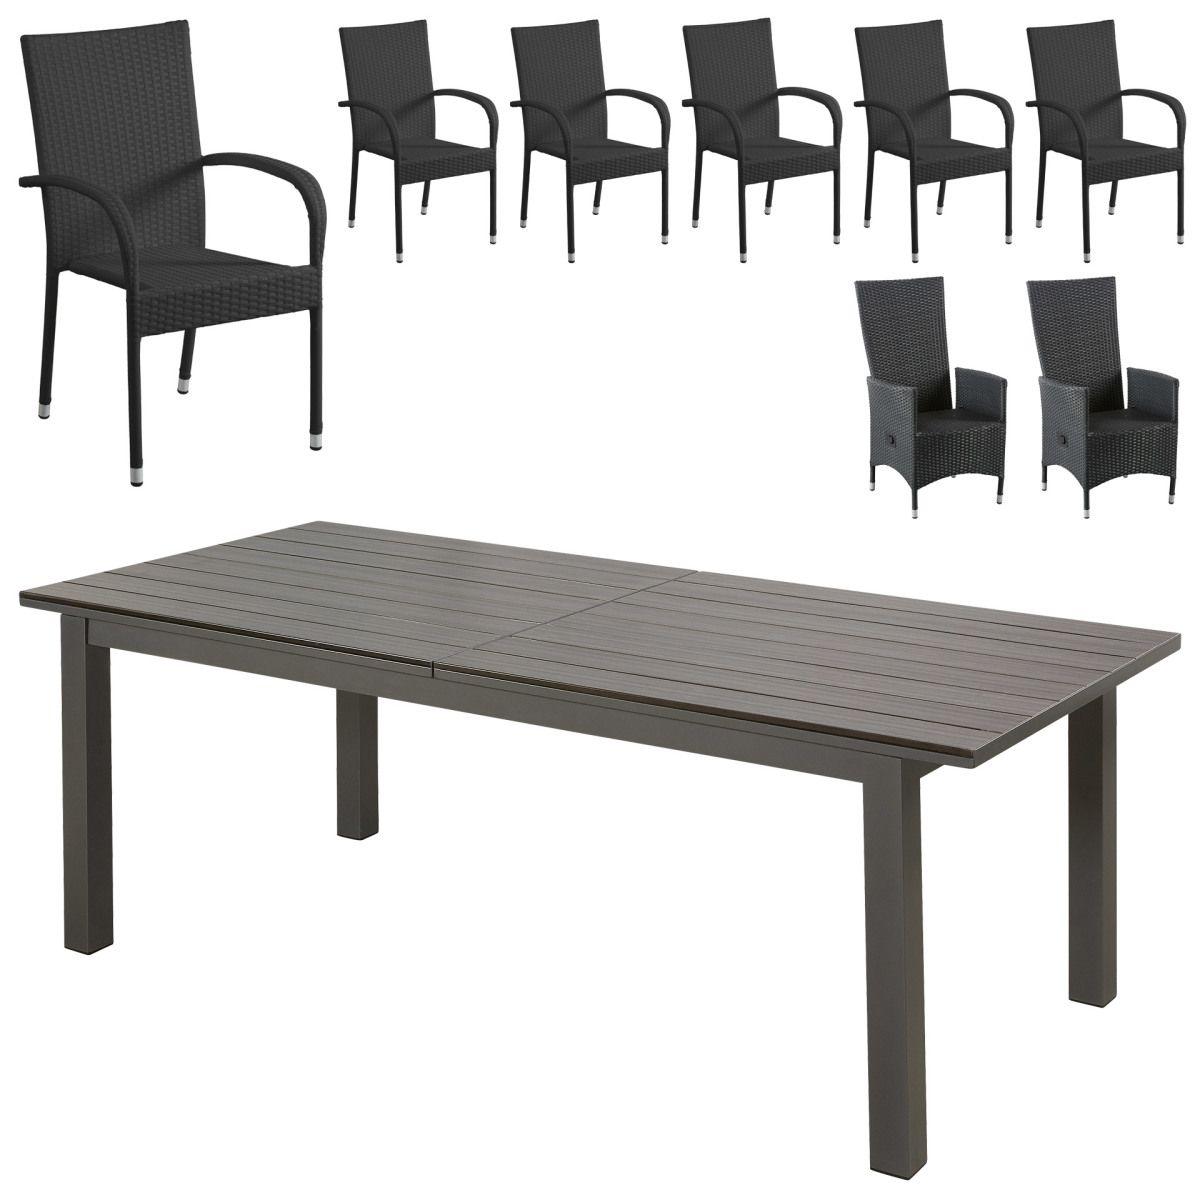 Gartenmöbel Set California/Palermo/Rio Grande (1 Tisch, 6